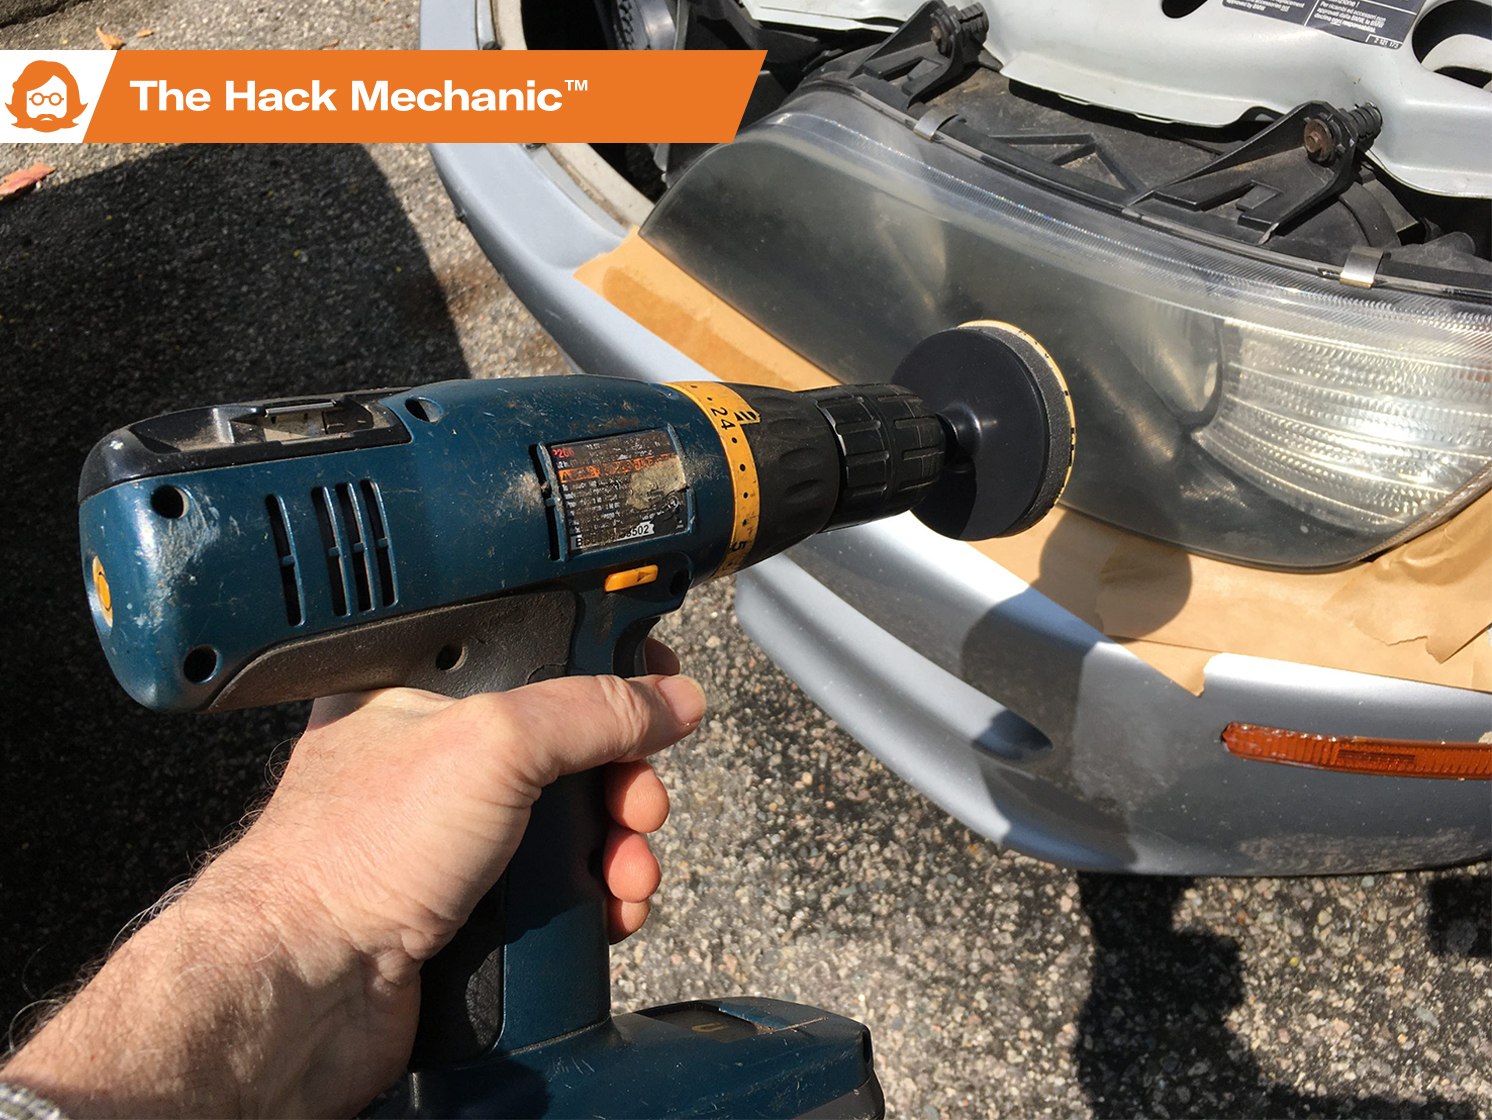 Hack-Mech-Headlight-Lede